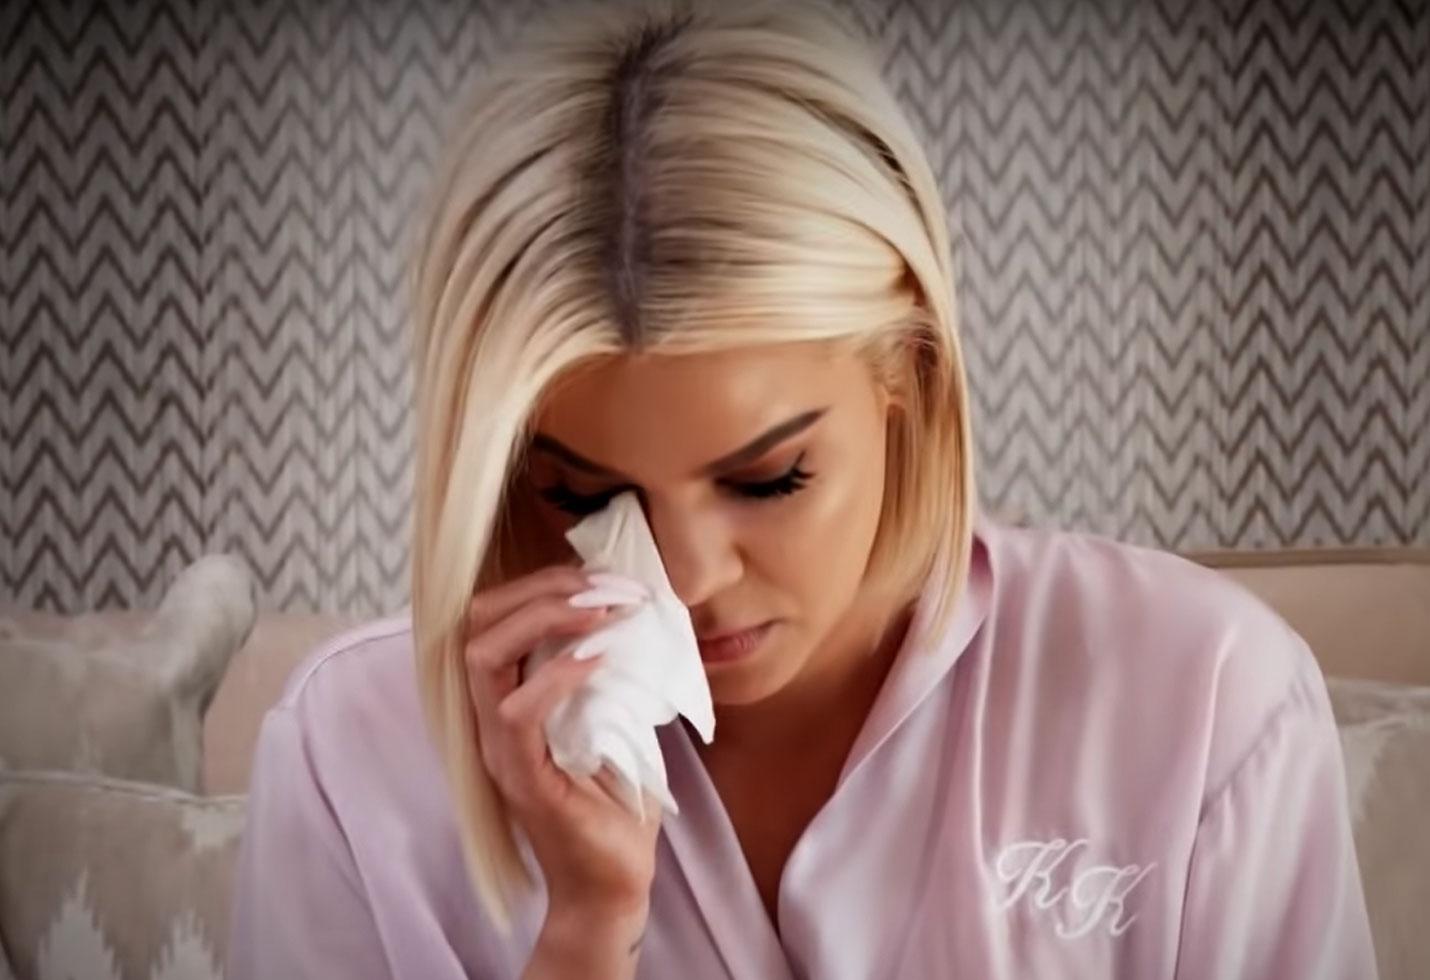 Kuwtk trailer khloe kardashian crying tristan thompson jordyn woods cheating